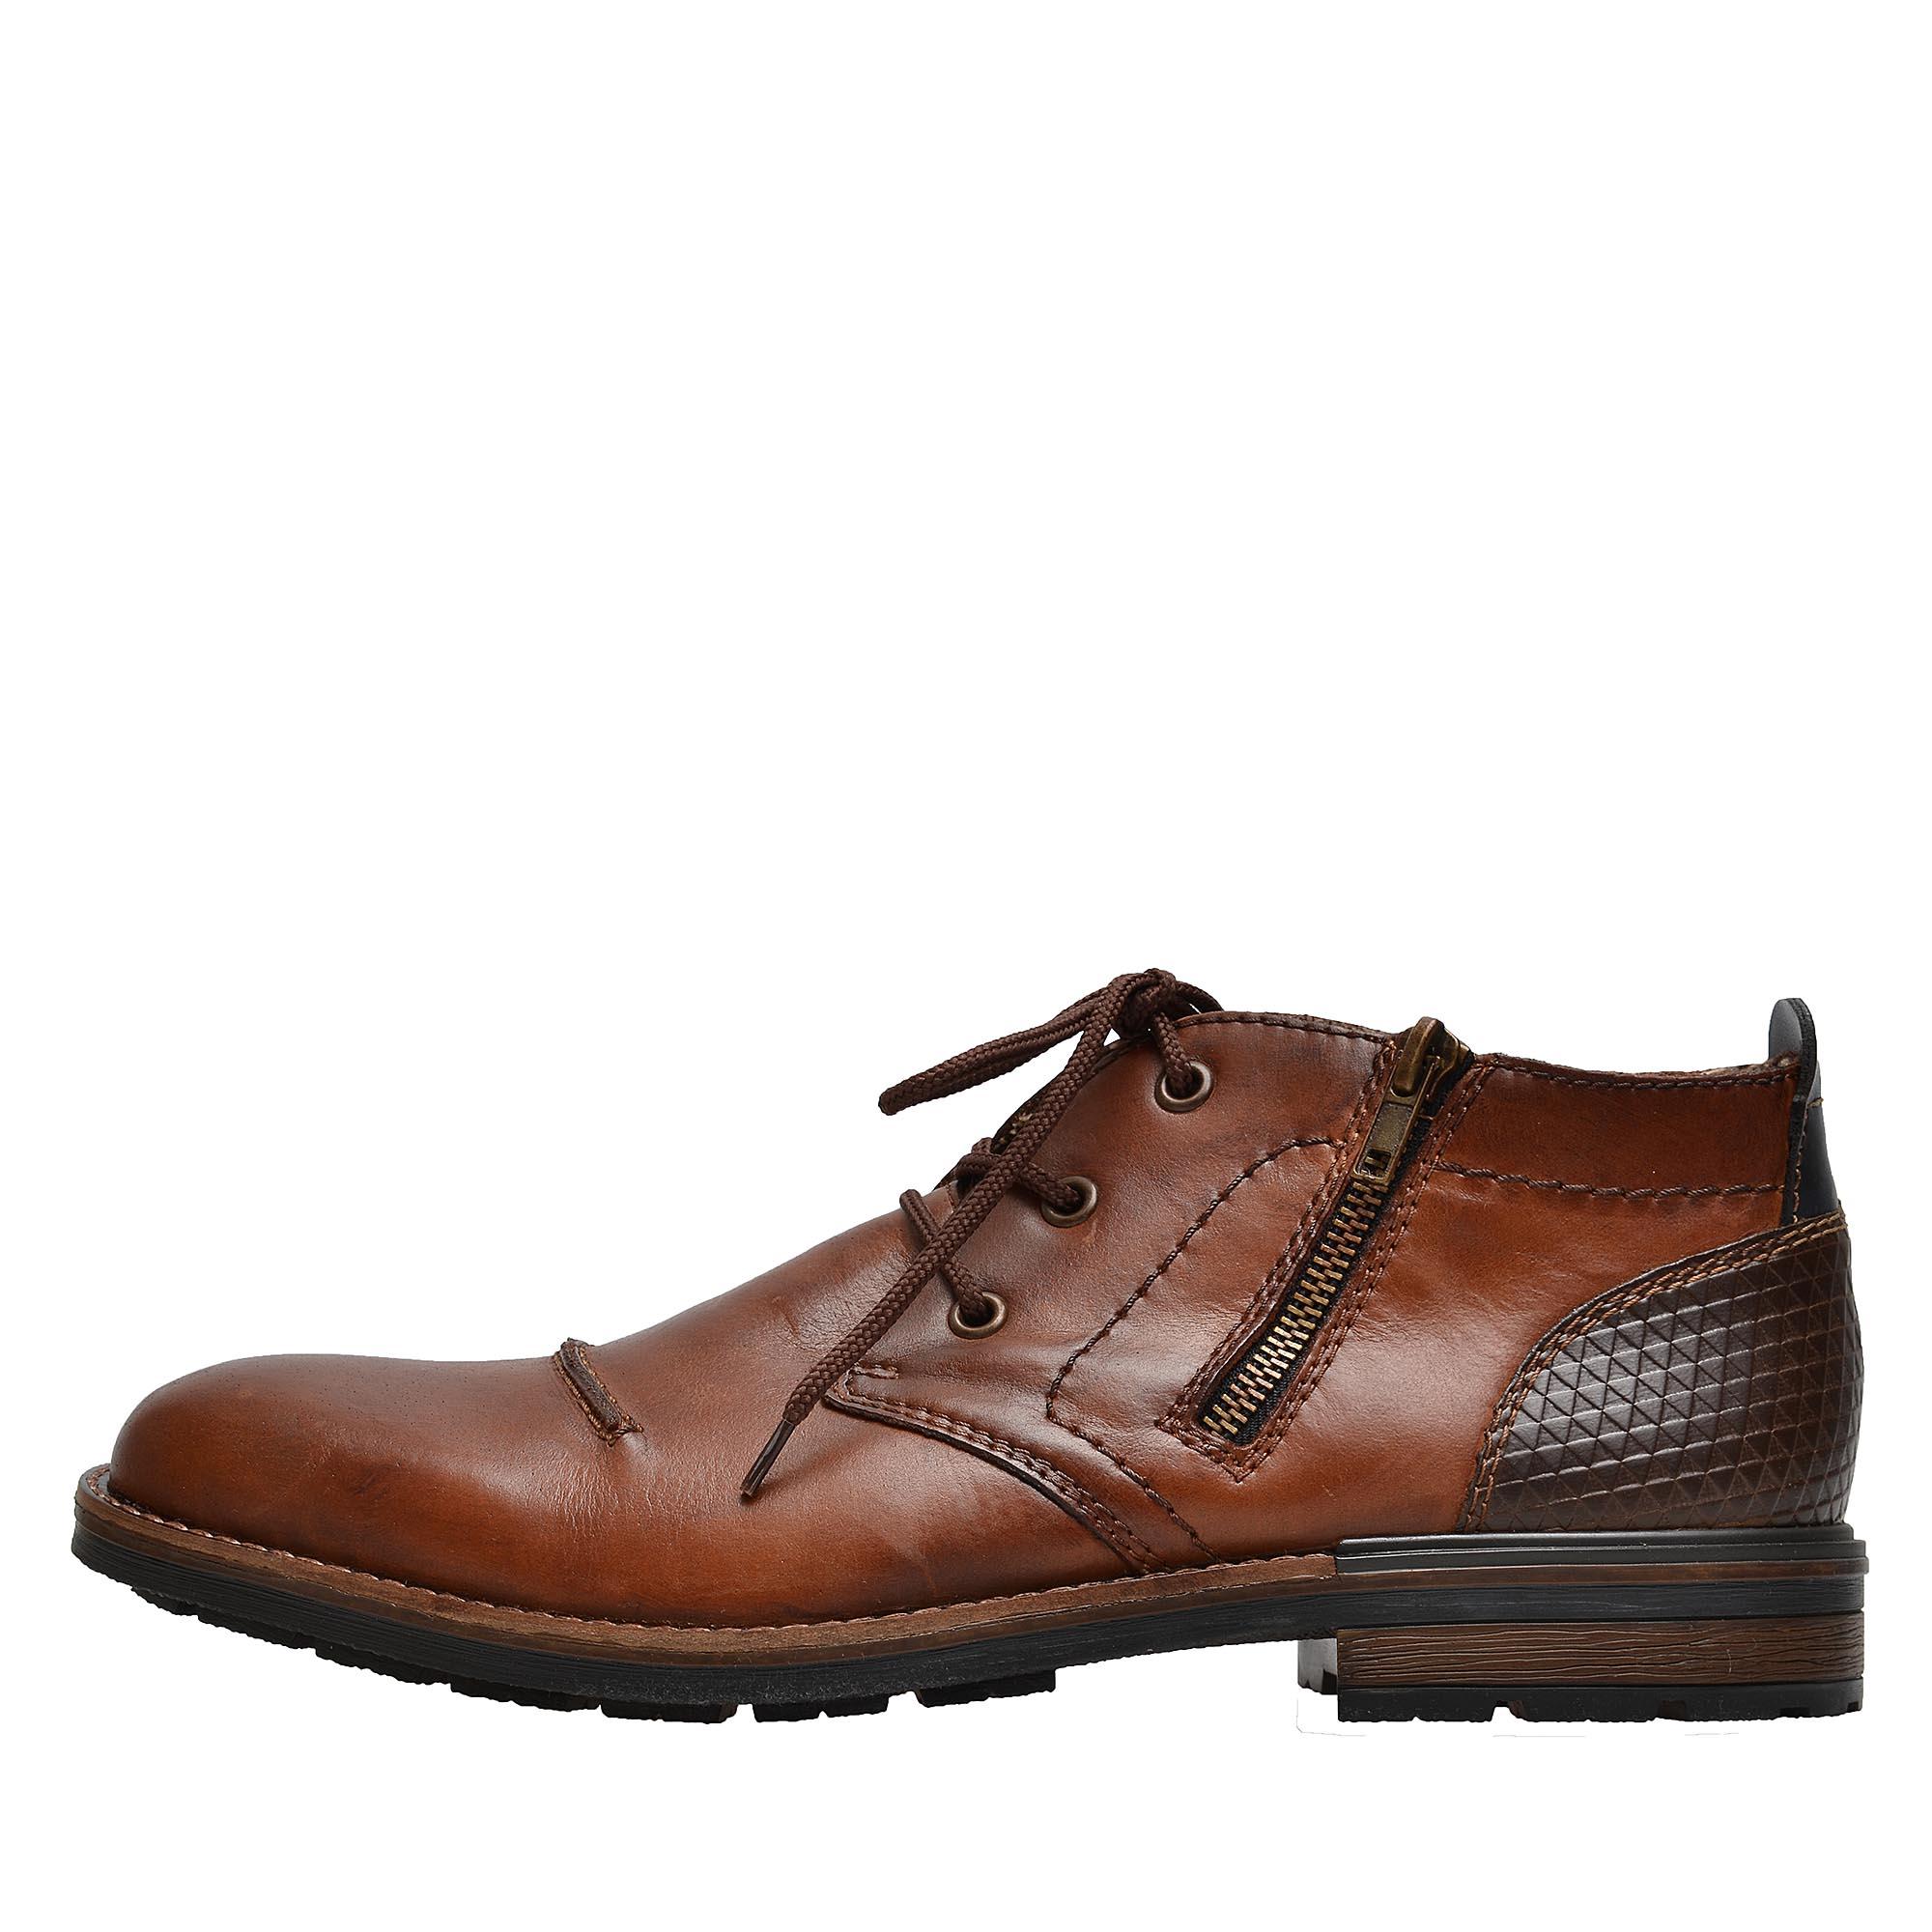 3bb7c557e2 detail Pánska obuv RIEKER B1344 25 BRAUN H W 8